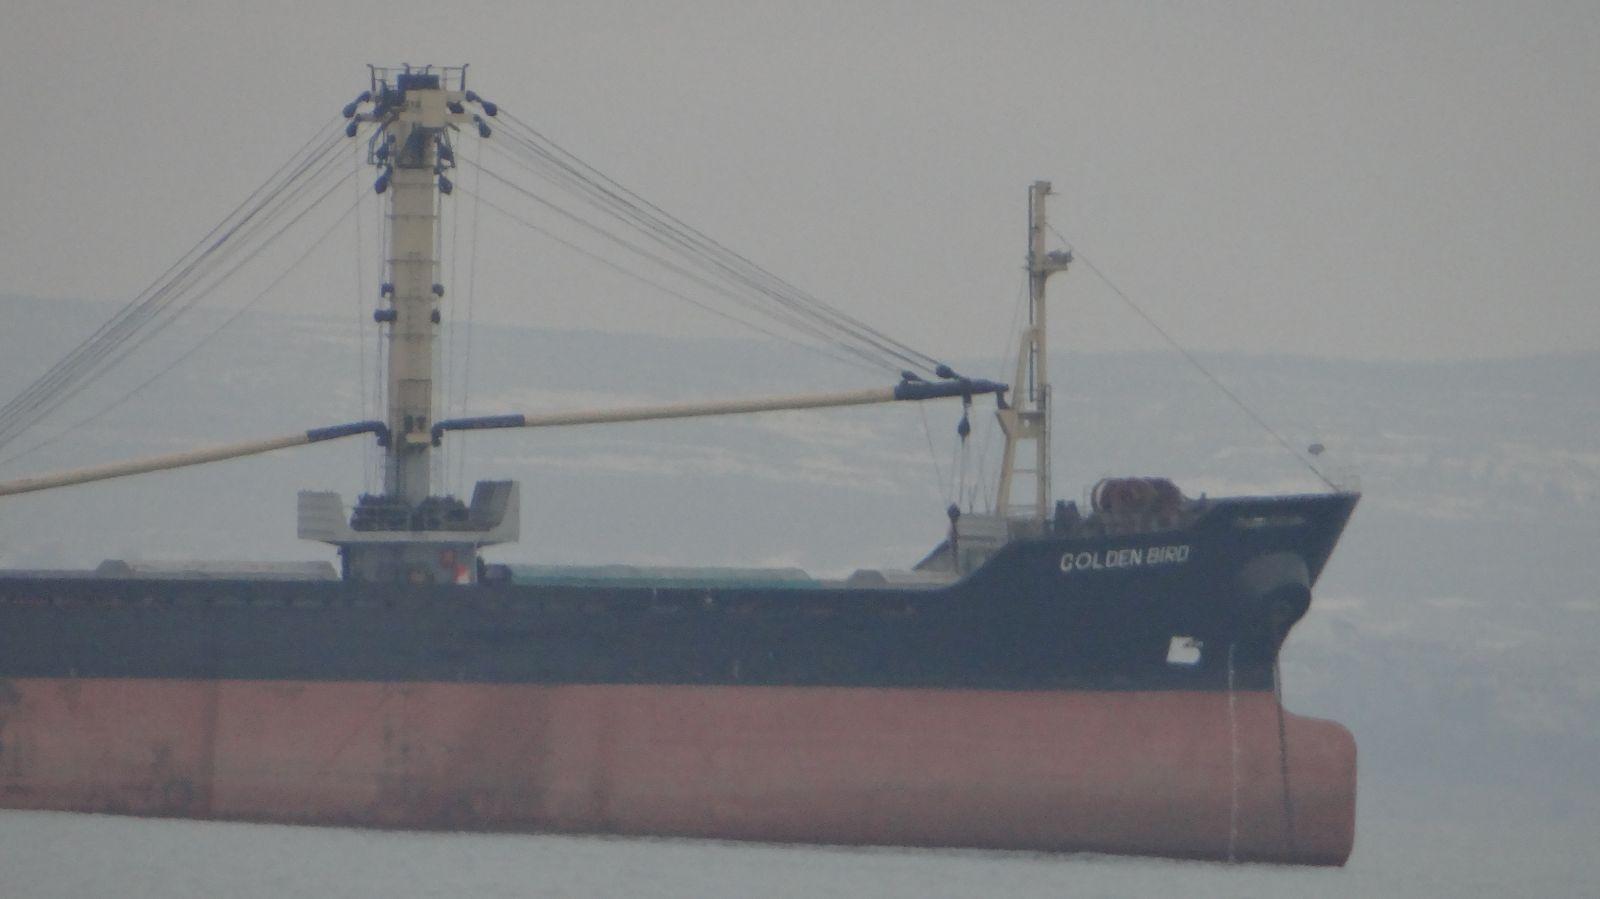 "ПАНОРАМА ОТ БУРГАС: Бълкер Golden Bird, танкер Azov Mariner, влекач Golden Blessed и кораб-ресторант ""Мирела""! (ОБНОВЕНА)"